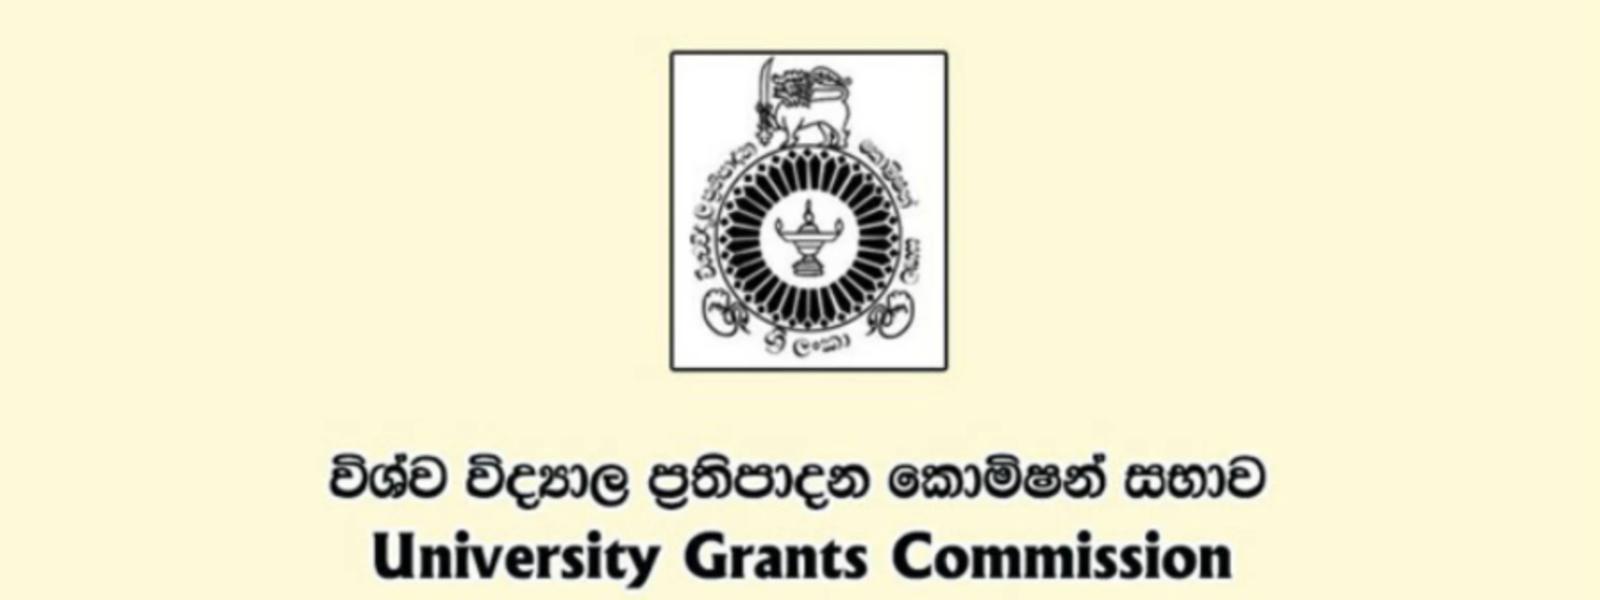 University students to receive COVID-19 jab: UGC